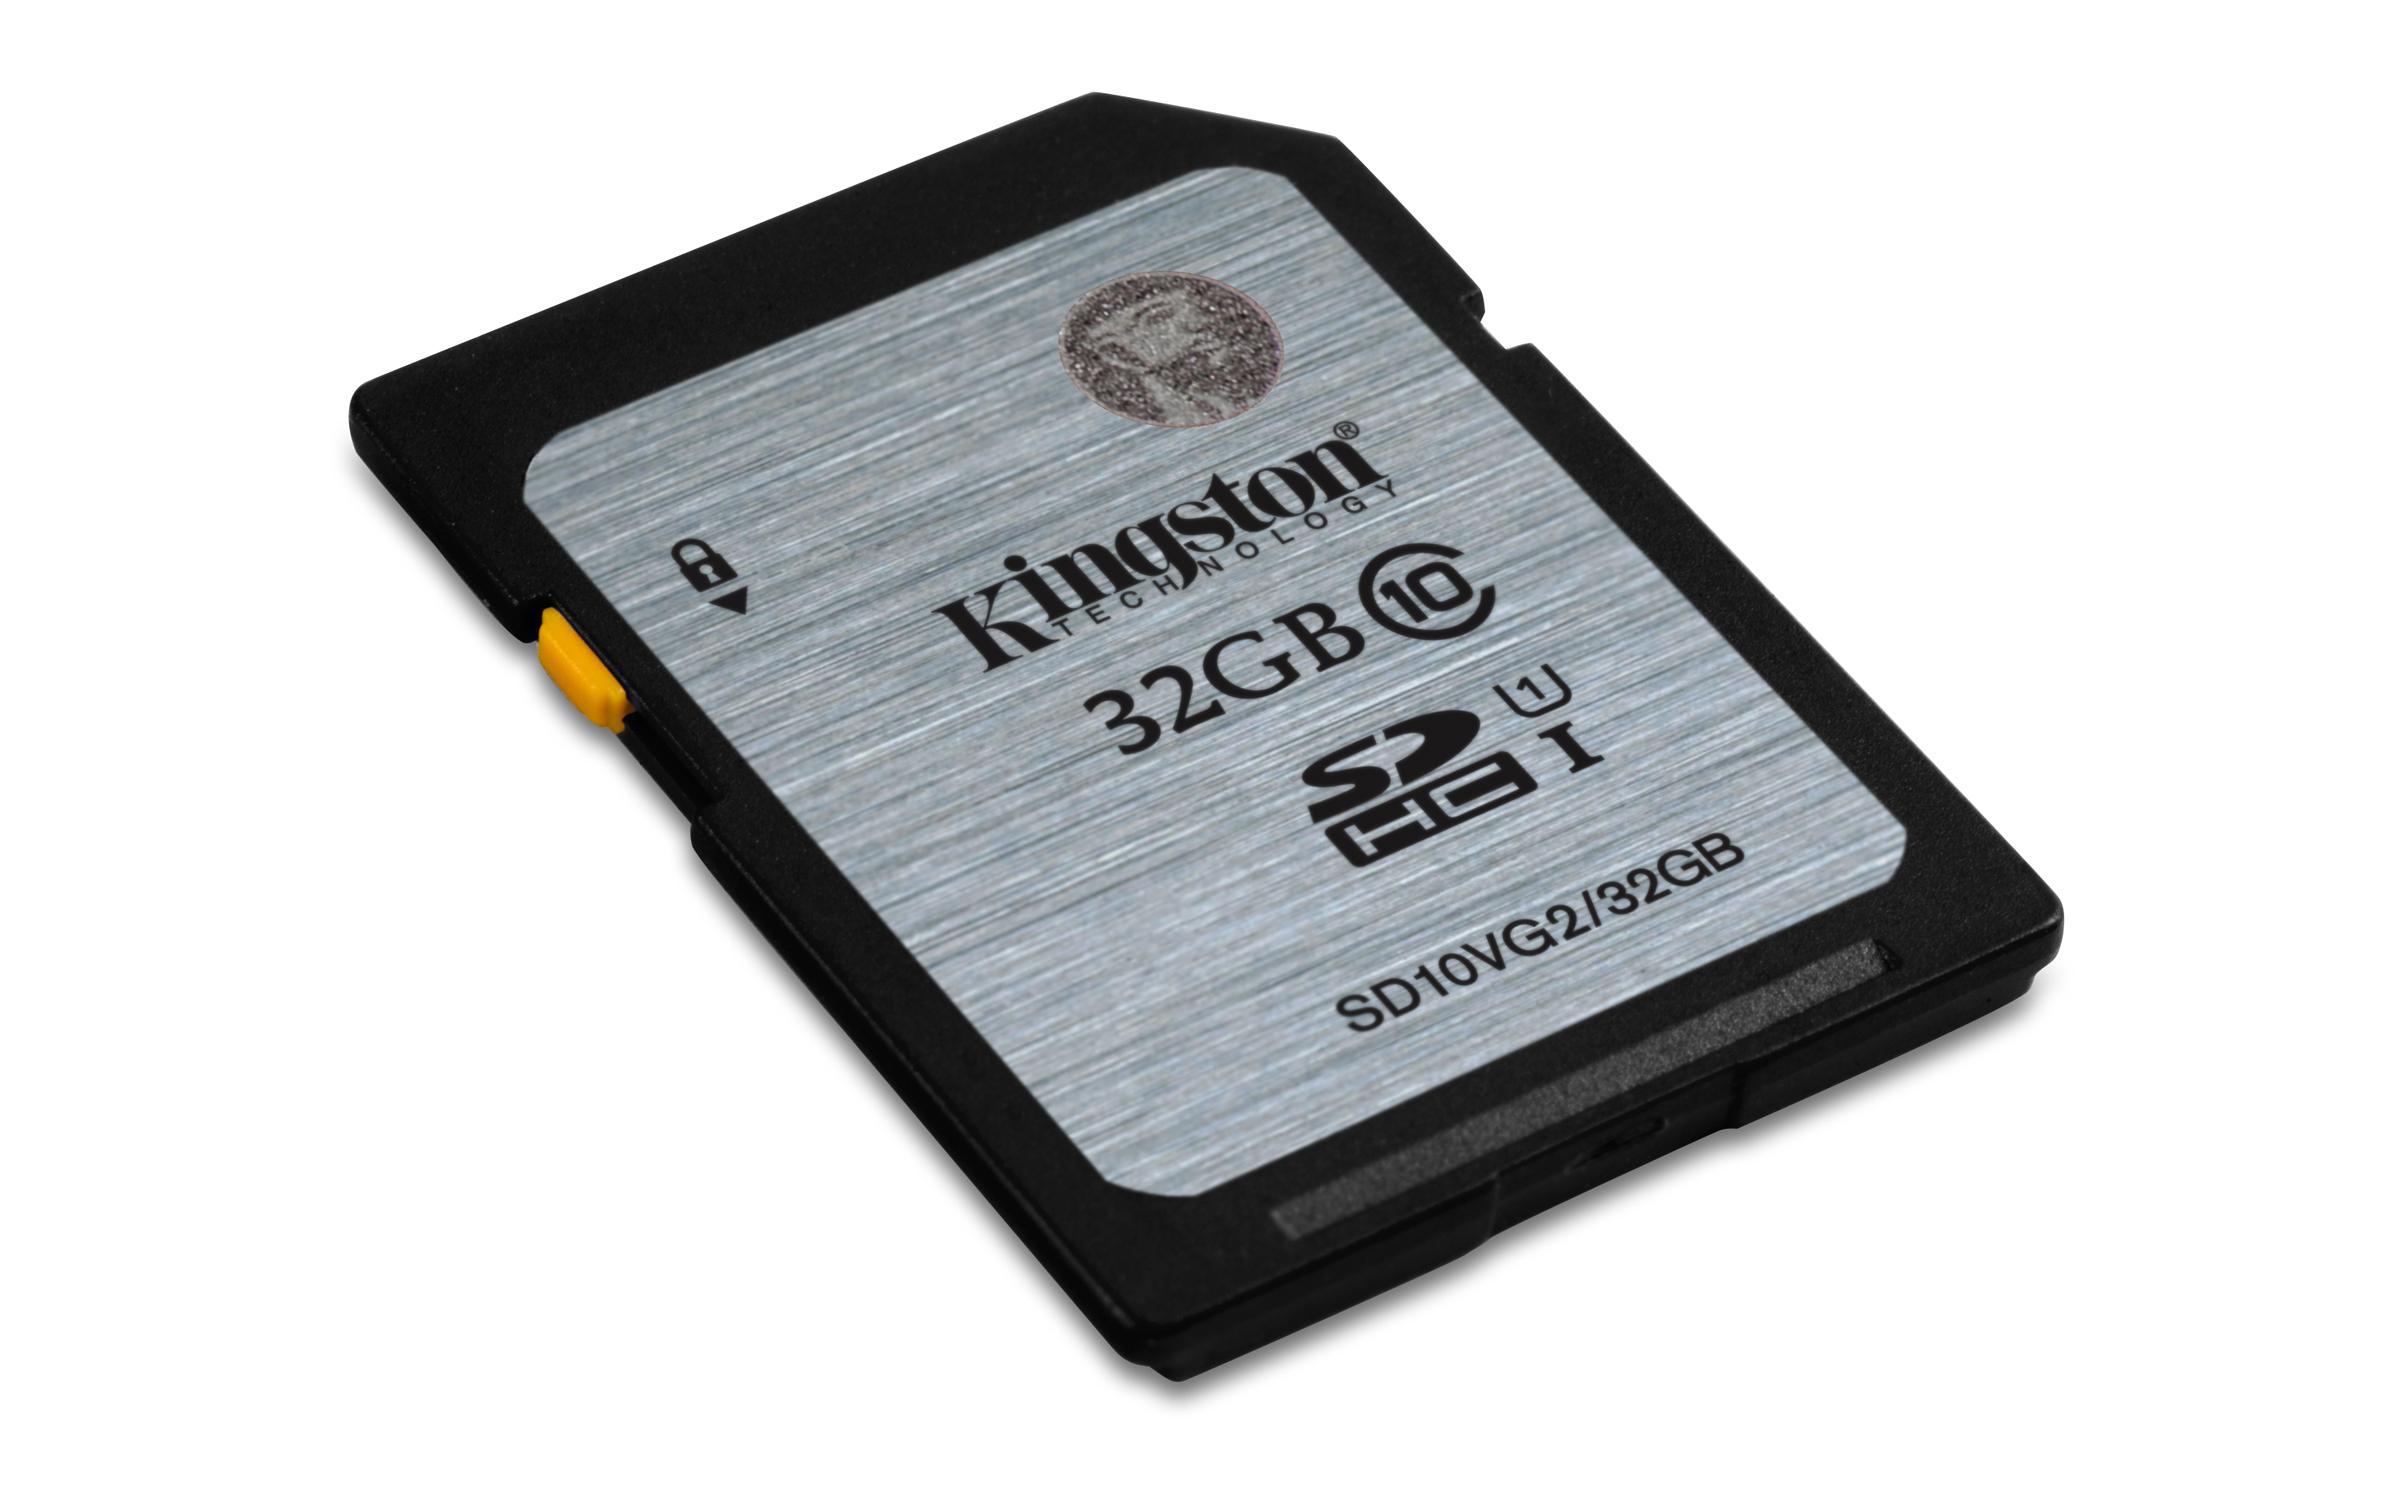 Kingston Technology Class 10 UHS-I SDHC 32GB 32GB SDHC UHS Class 10 memory card